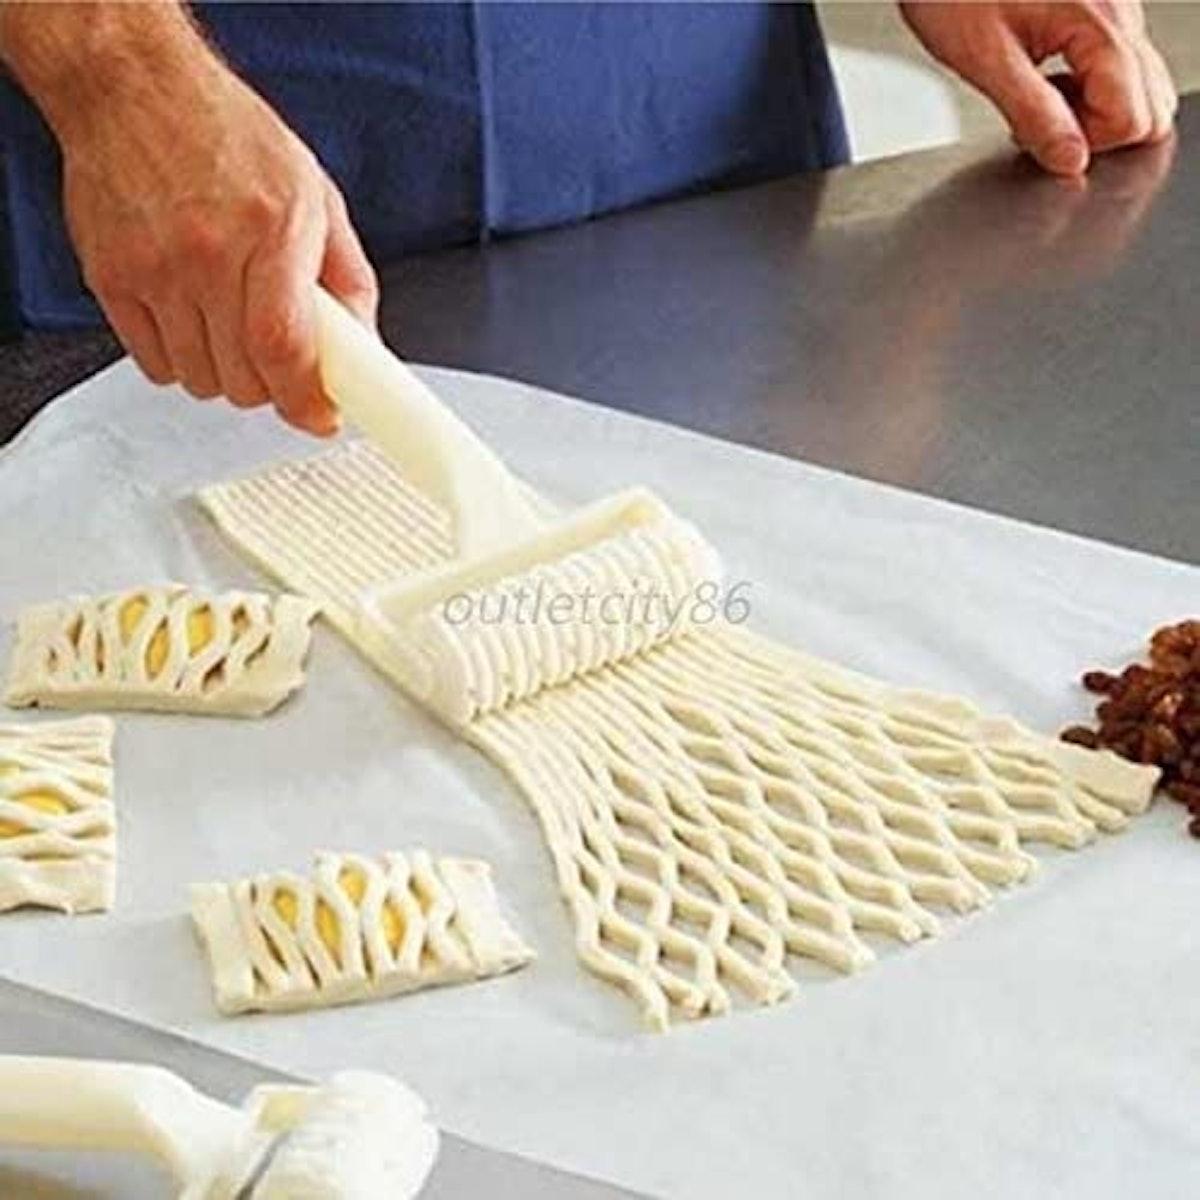 Easy Gadgets Kitchen Bakery Tool Kit